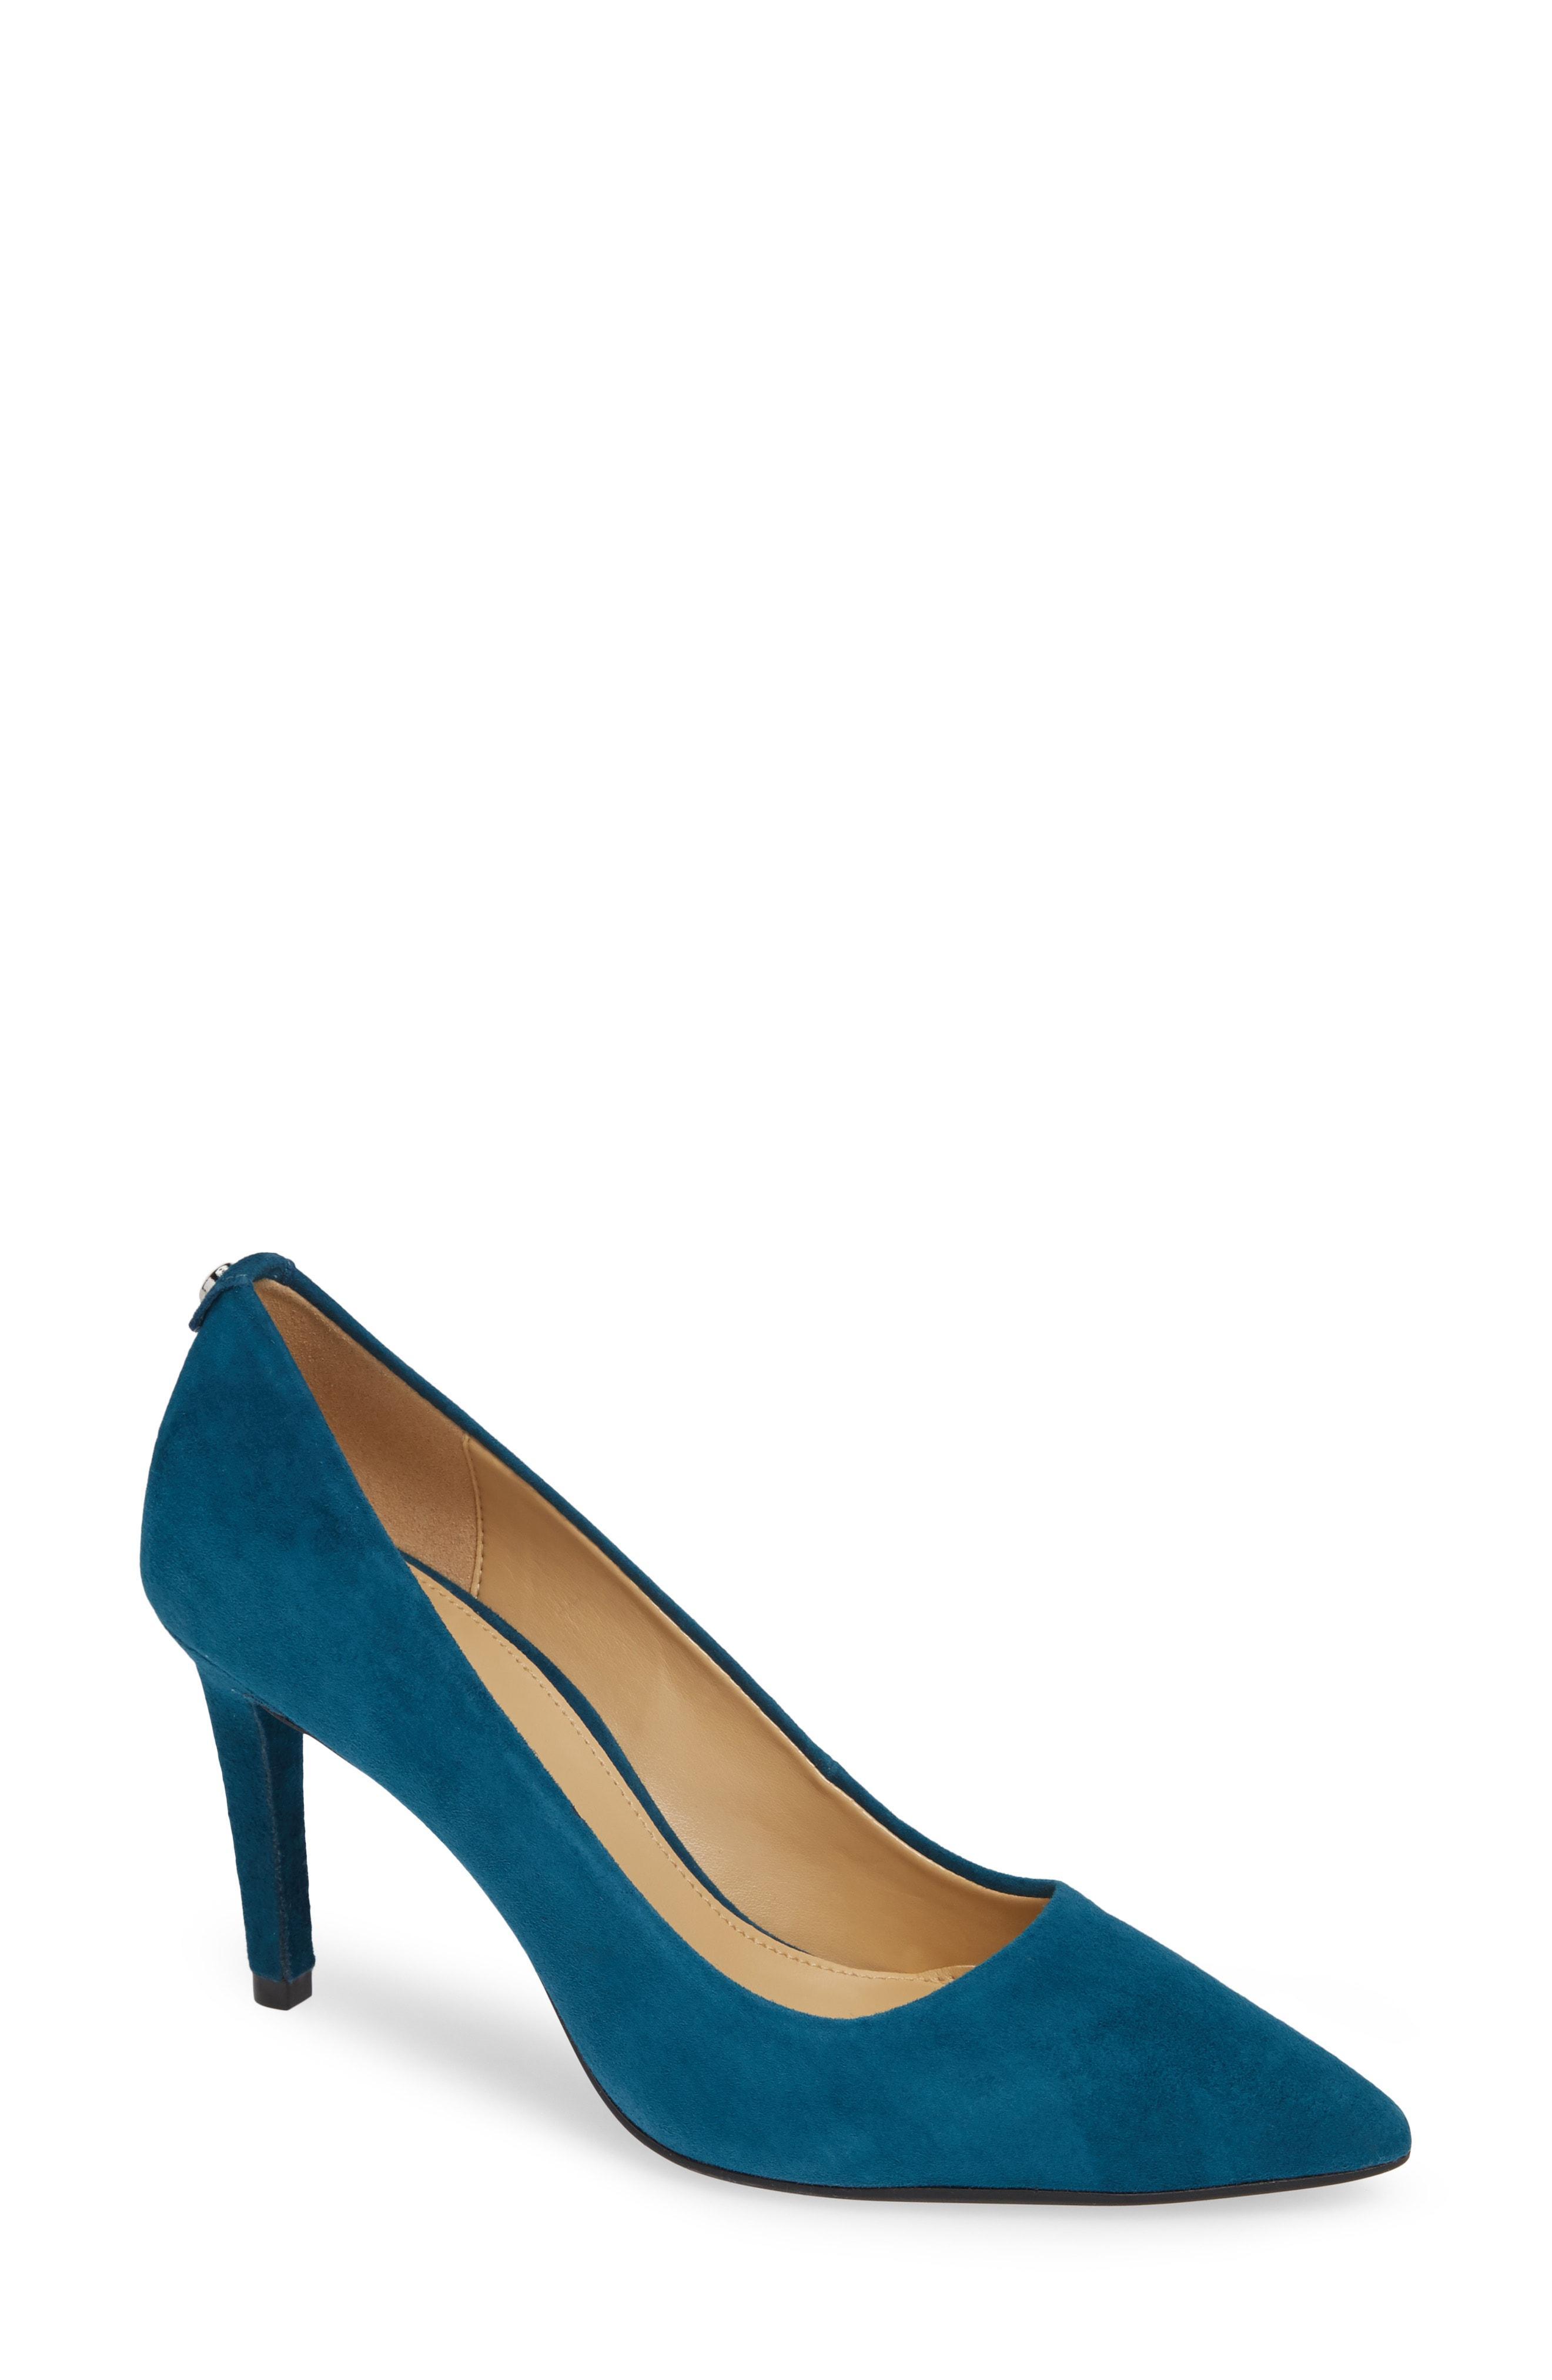 1ad31c920a9 Lyst - MICHAEL Michael Kors Dorothy Flex Pump in Blue